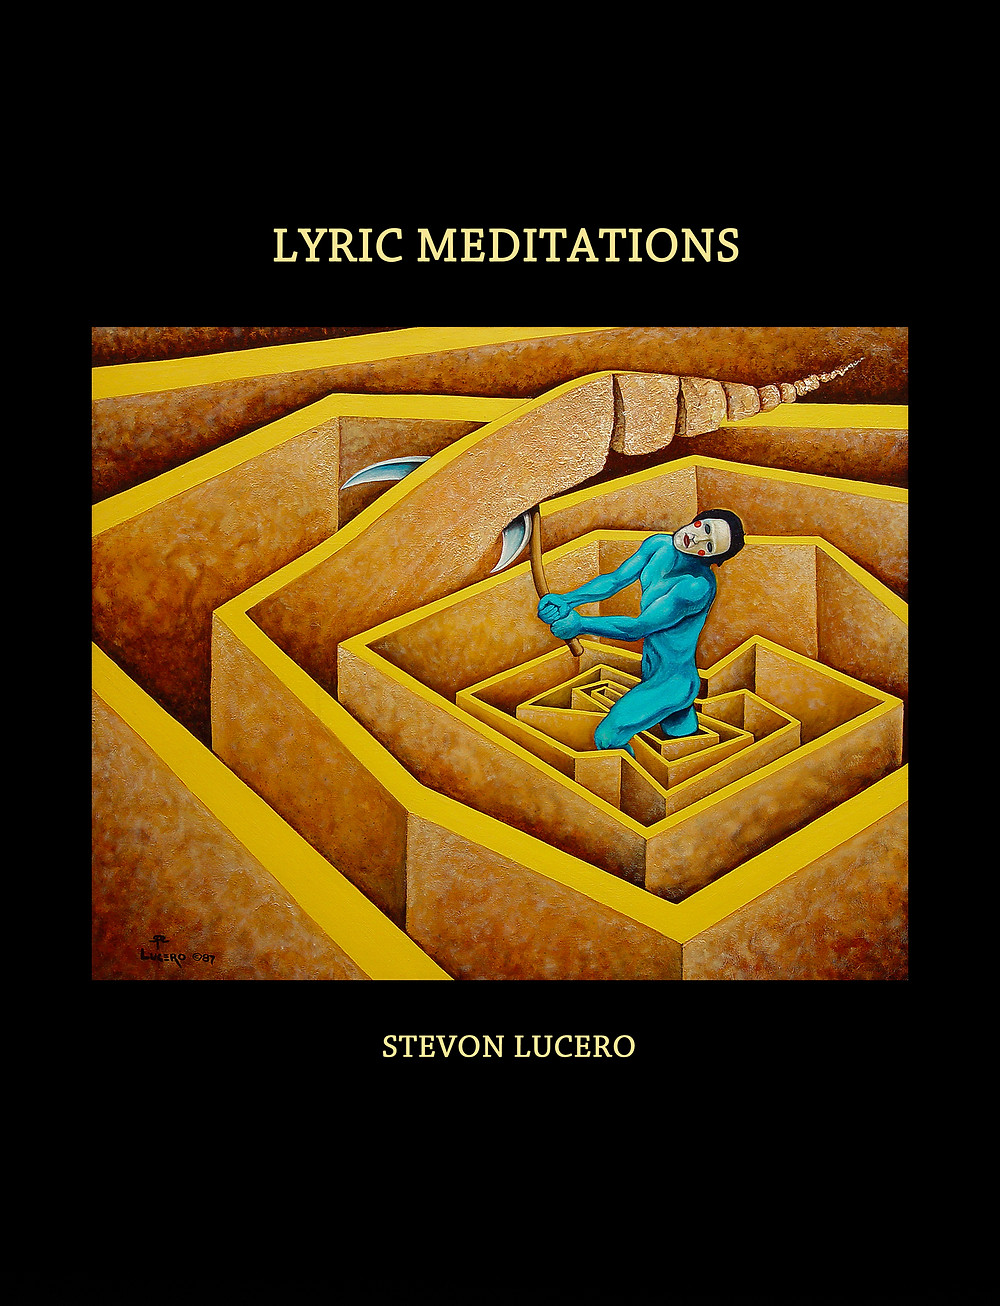 Lyric Meditations by Stevon Lucero